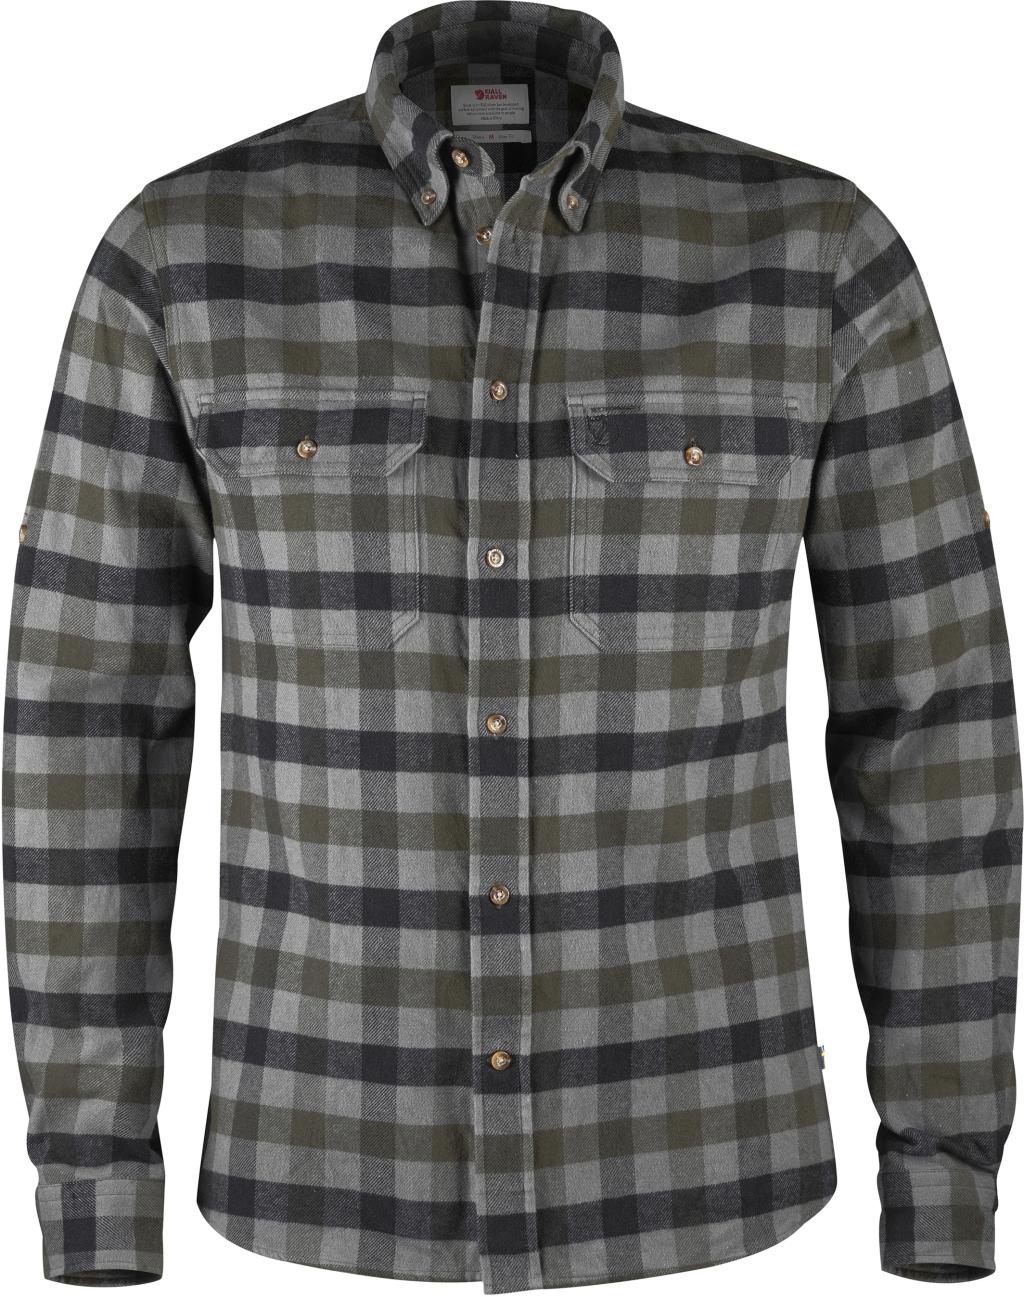 FjallRaven Skog Shirt Black-30